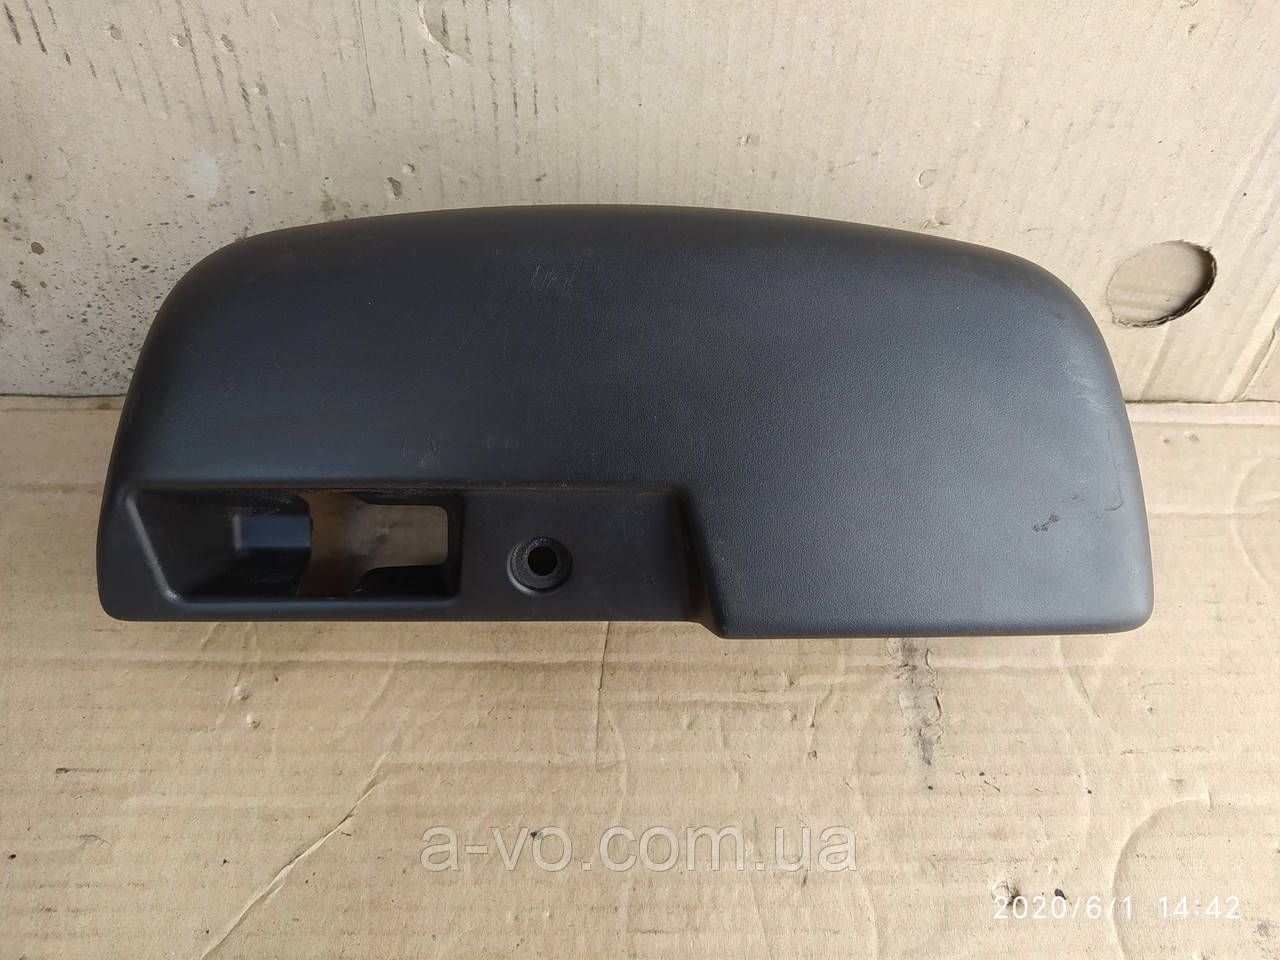 Накладка молдинг стеклоочистителя Peugeot 206  9642827677